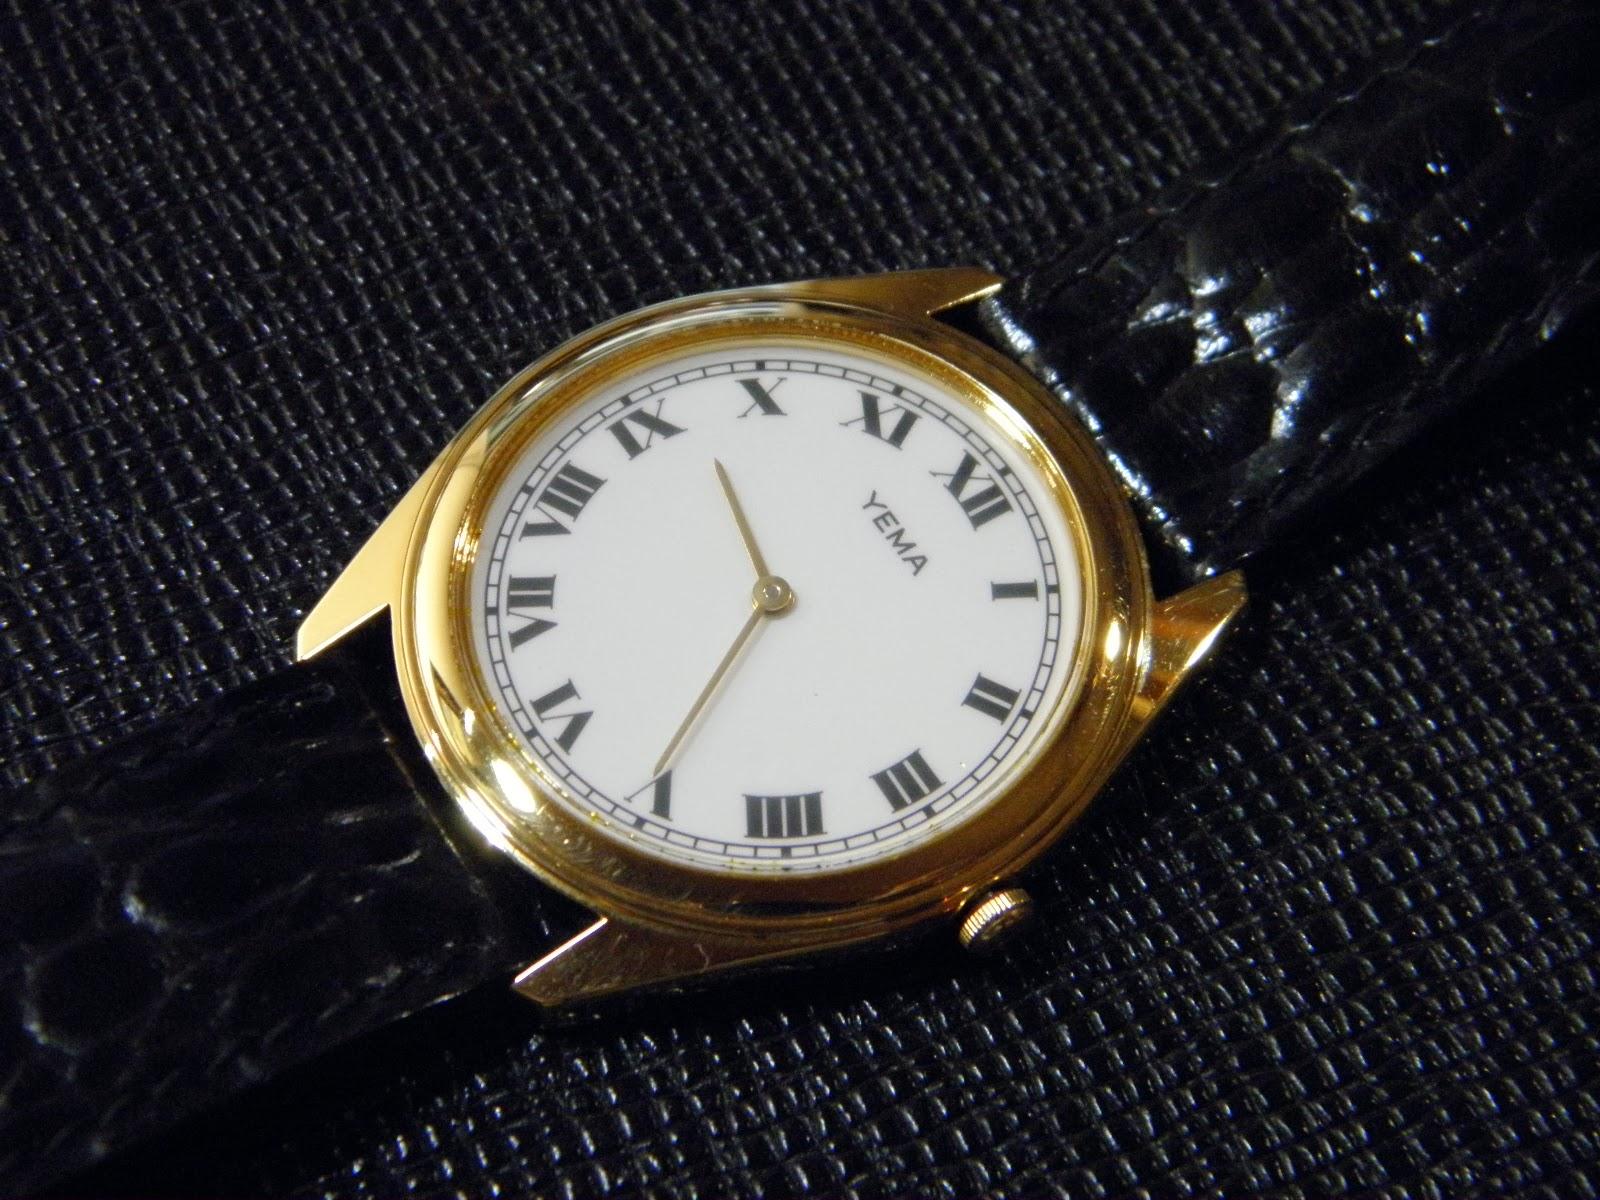 Kiosku Sold Yema Classic Charles Jourdan 1016 1312c Hitam Ring Silver Plat Putih Gold Plated Movement Quartz Japan Assembled In France Dia 36 Mm W C Dial Seperti Keramik Dengan Index Romawi